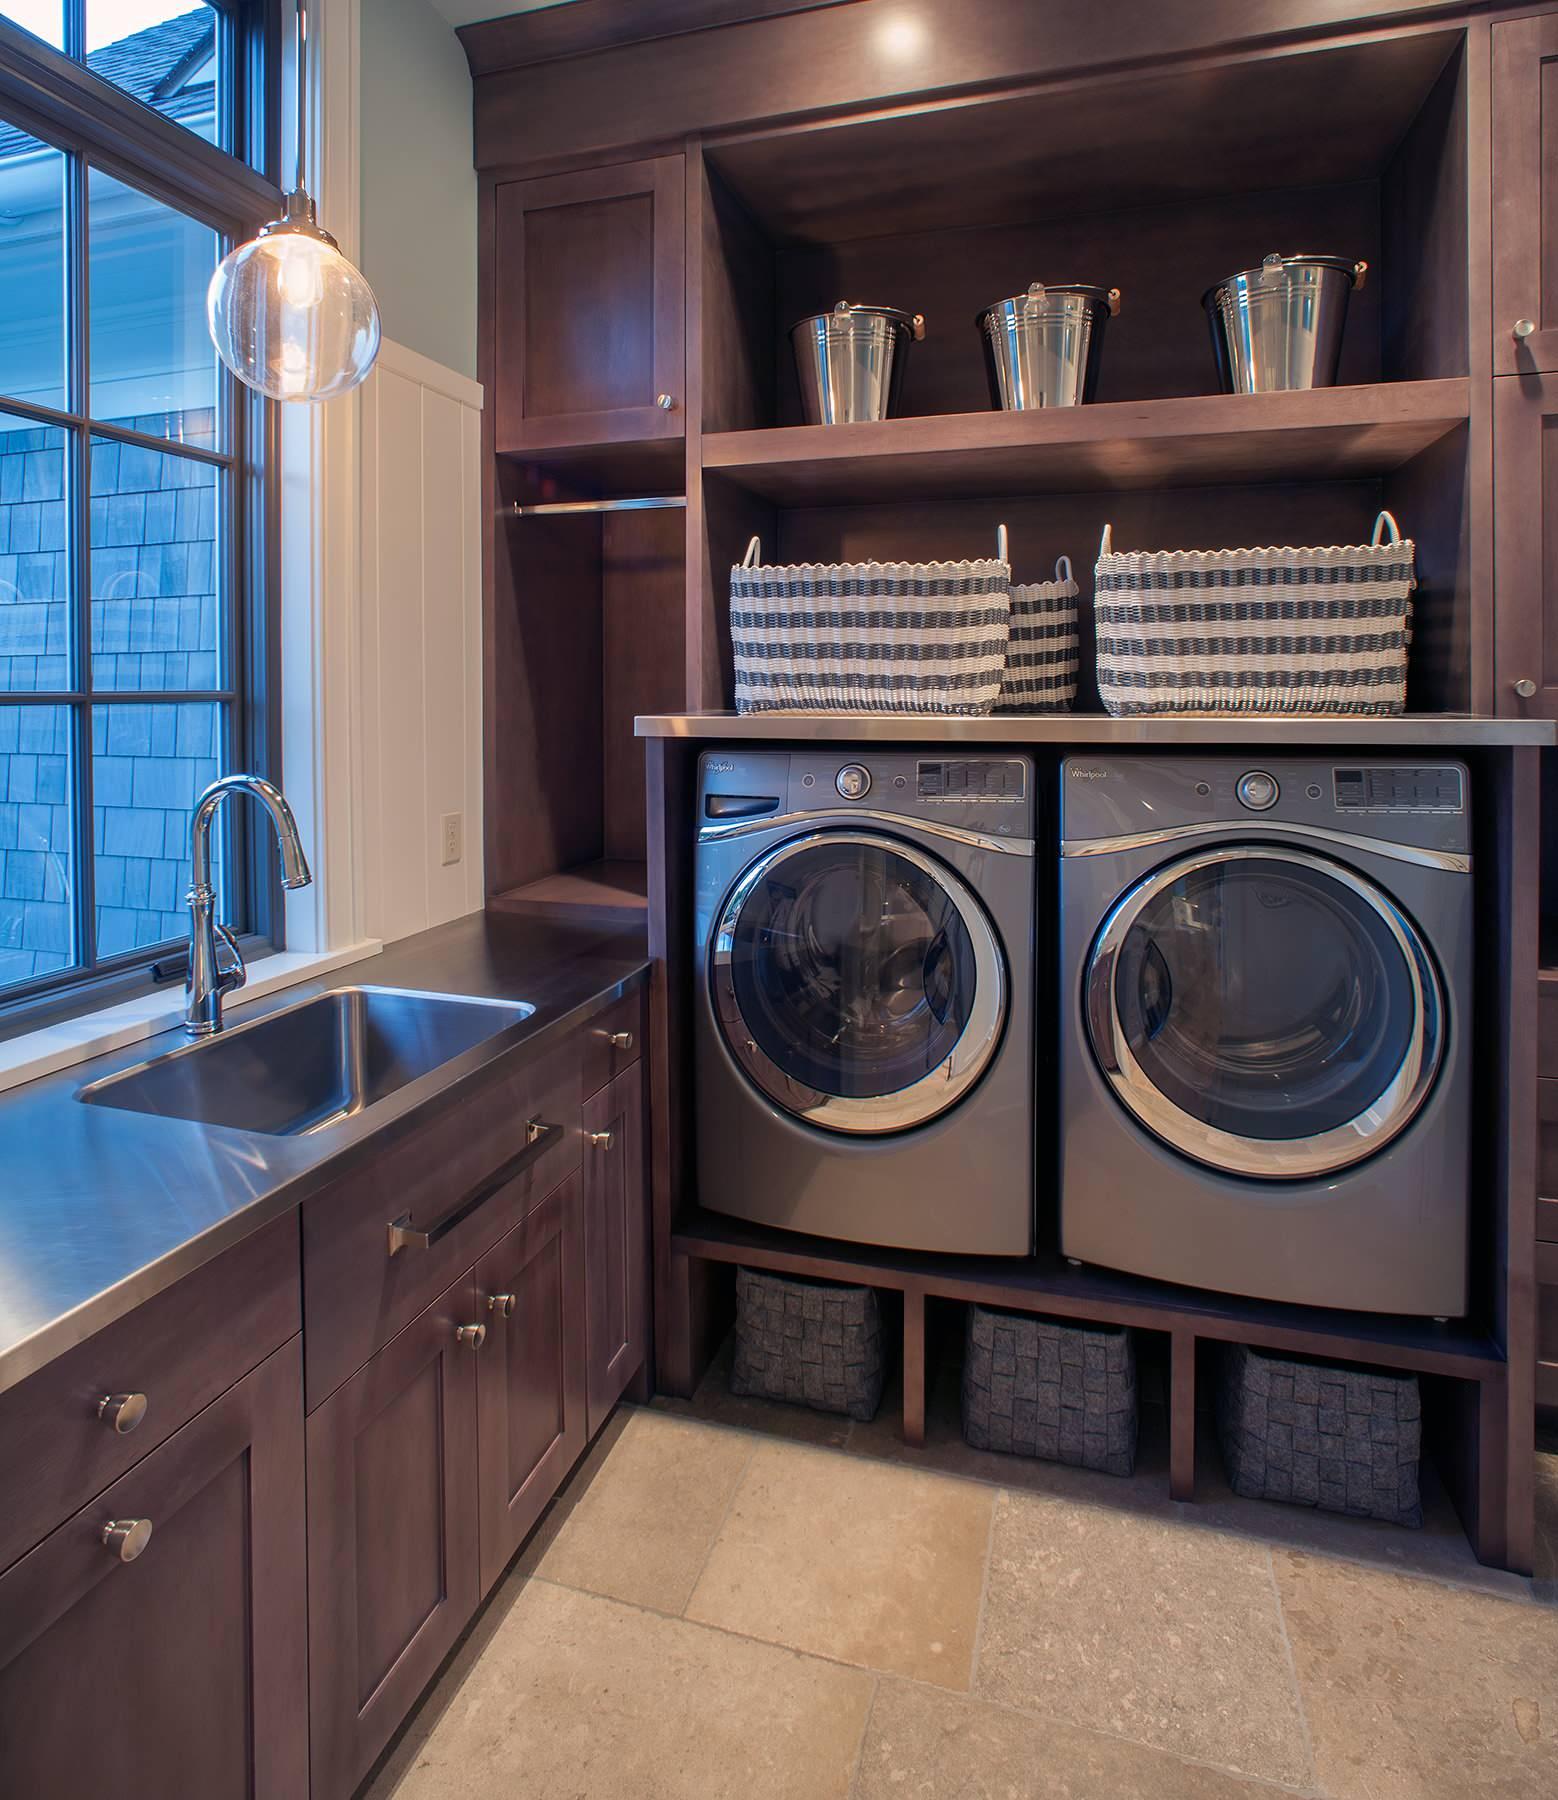 19 Beautiful Ceramic Tile Laundry Room Pictures & Ideas